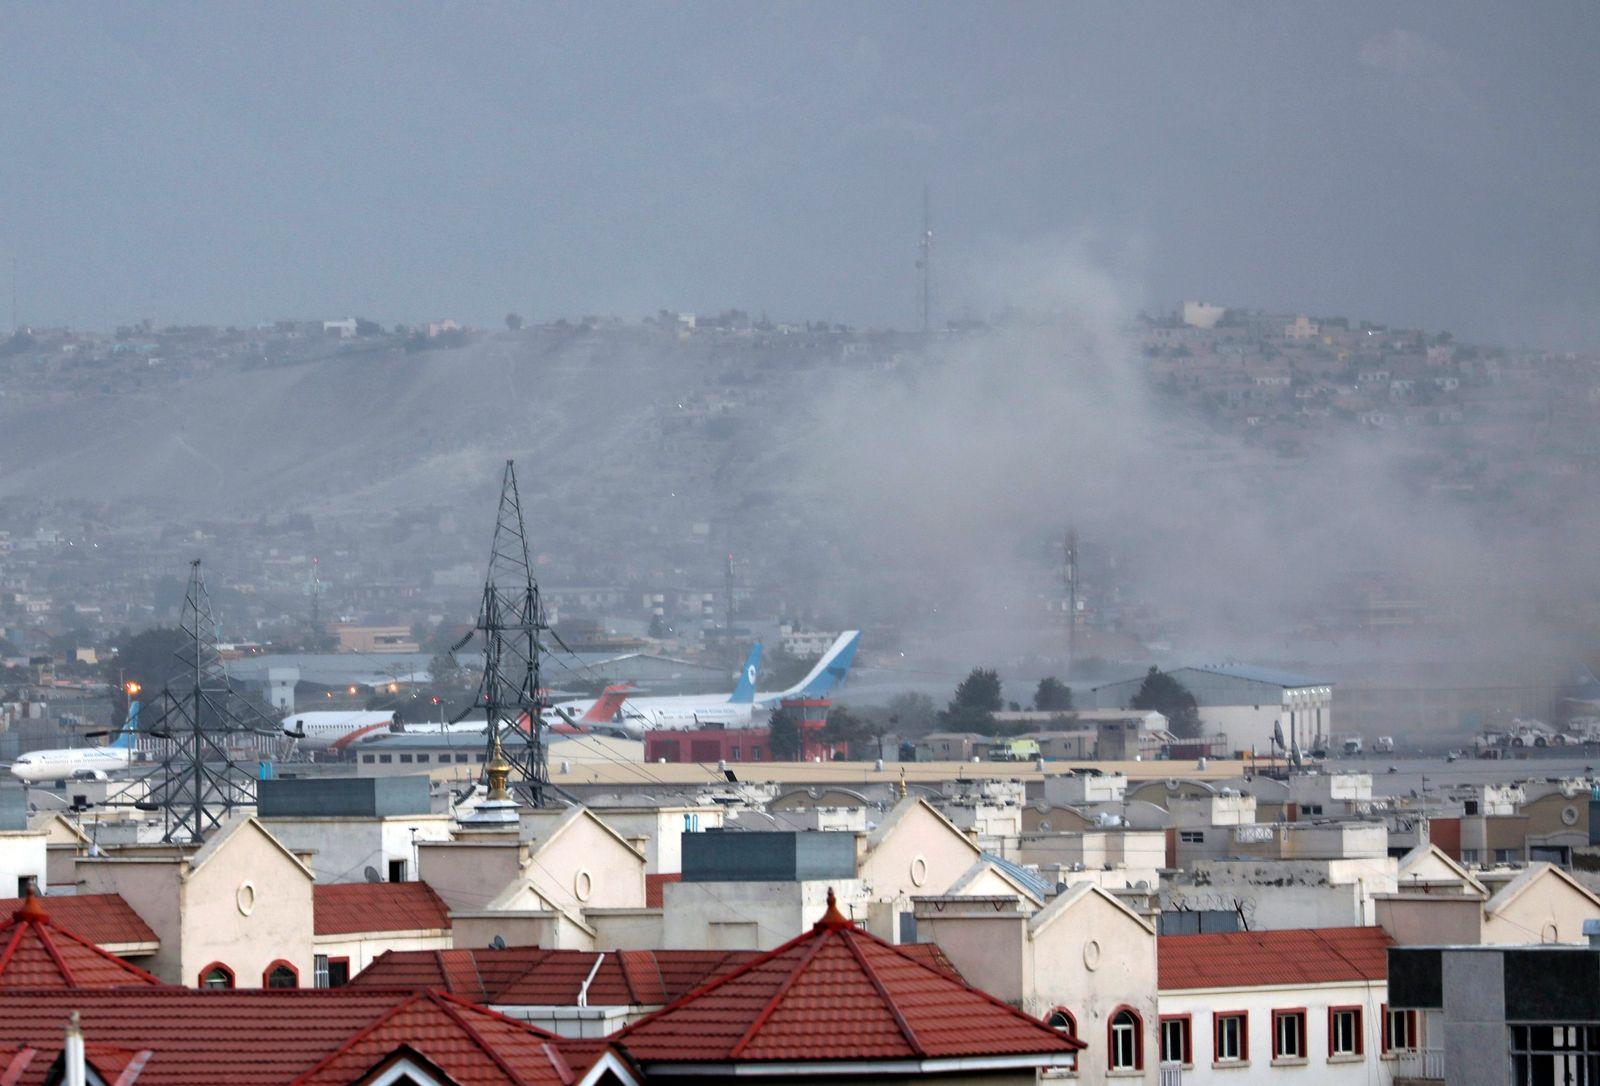 Konflikt in Afghanistan - Explosion in Kabul